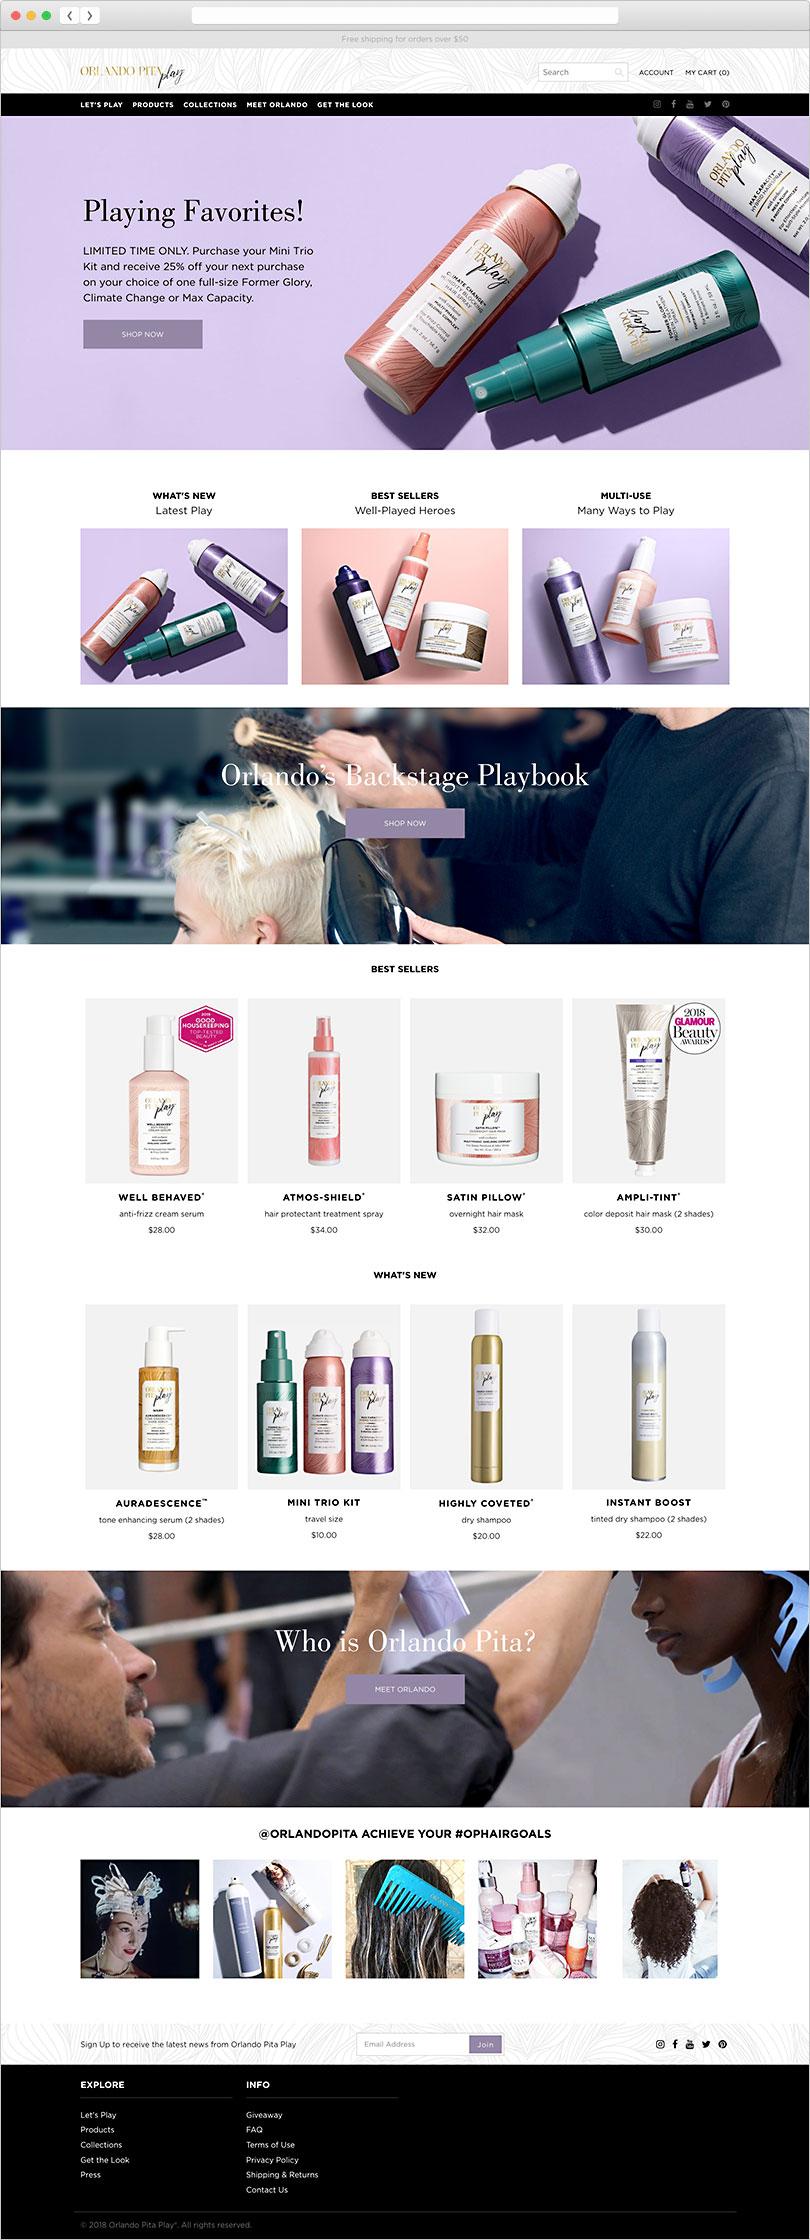 Orlando Pita - E-Commerce, Website Design & Development, Email Marketing, Creative Direction